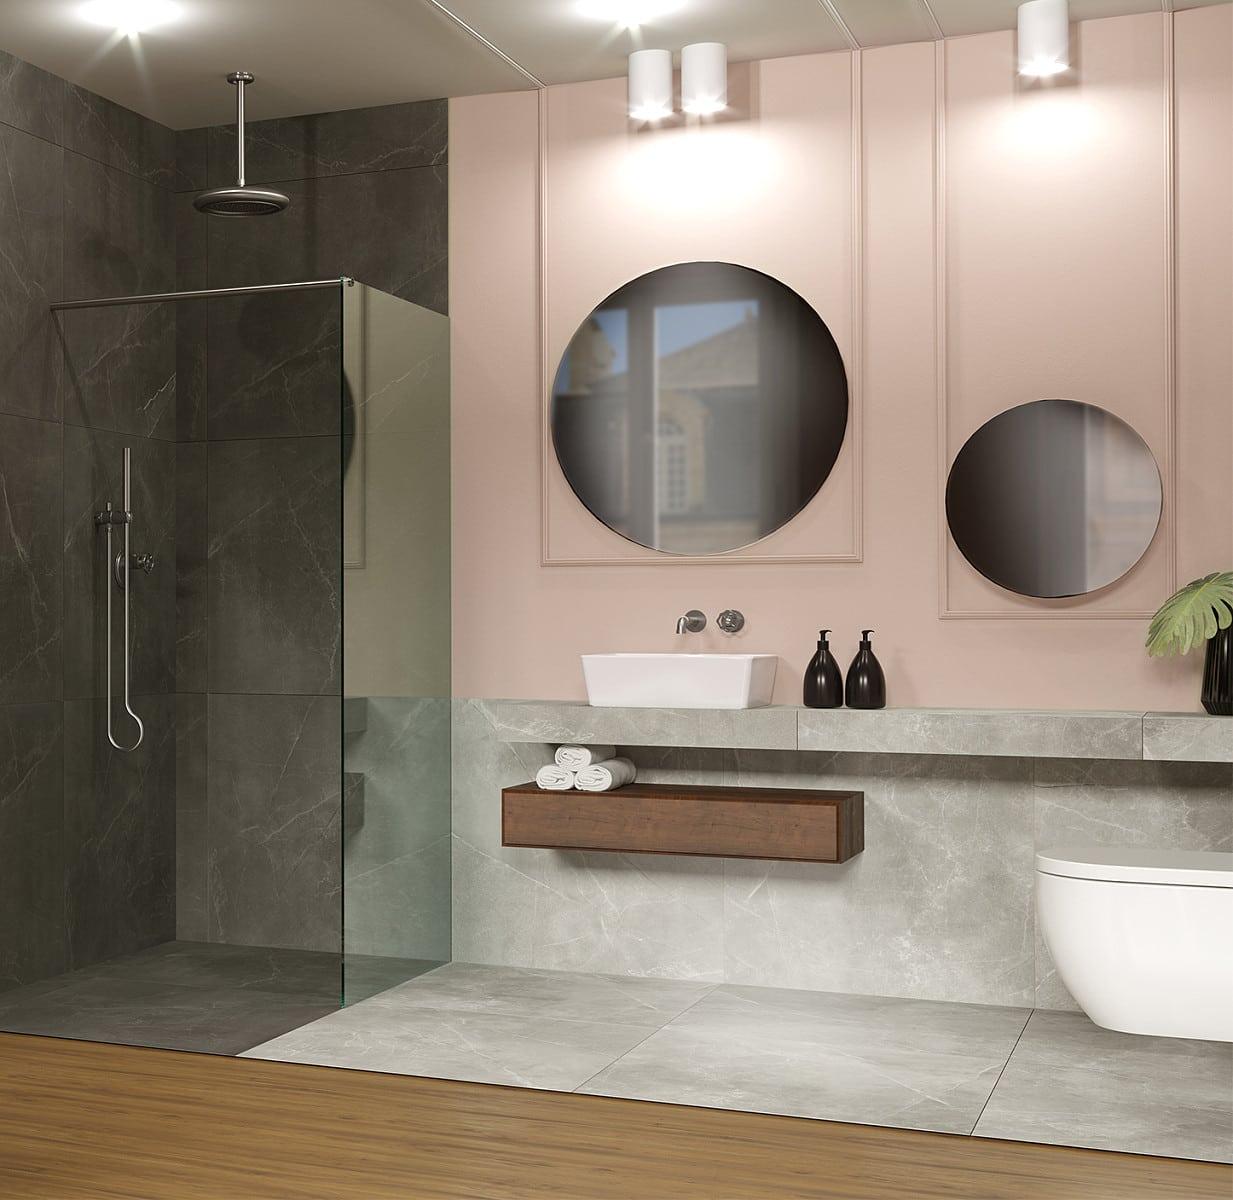 łazienka Art Deco Galeria Wnętrz Katowice Home Concept